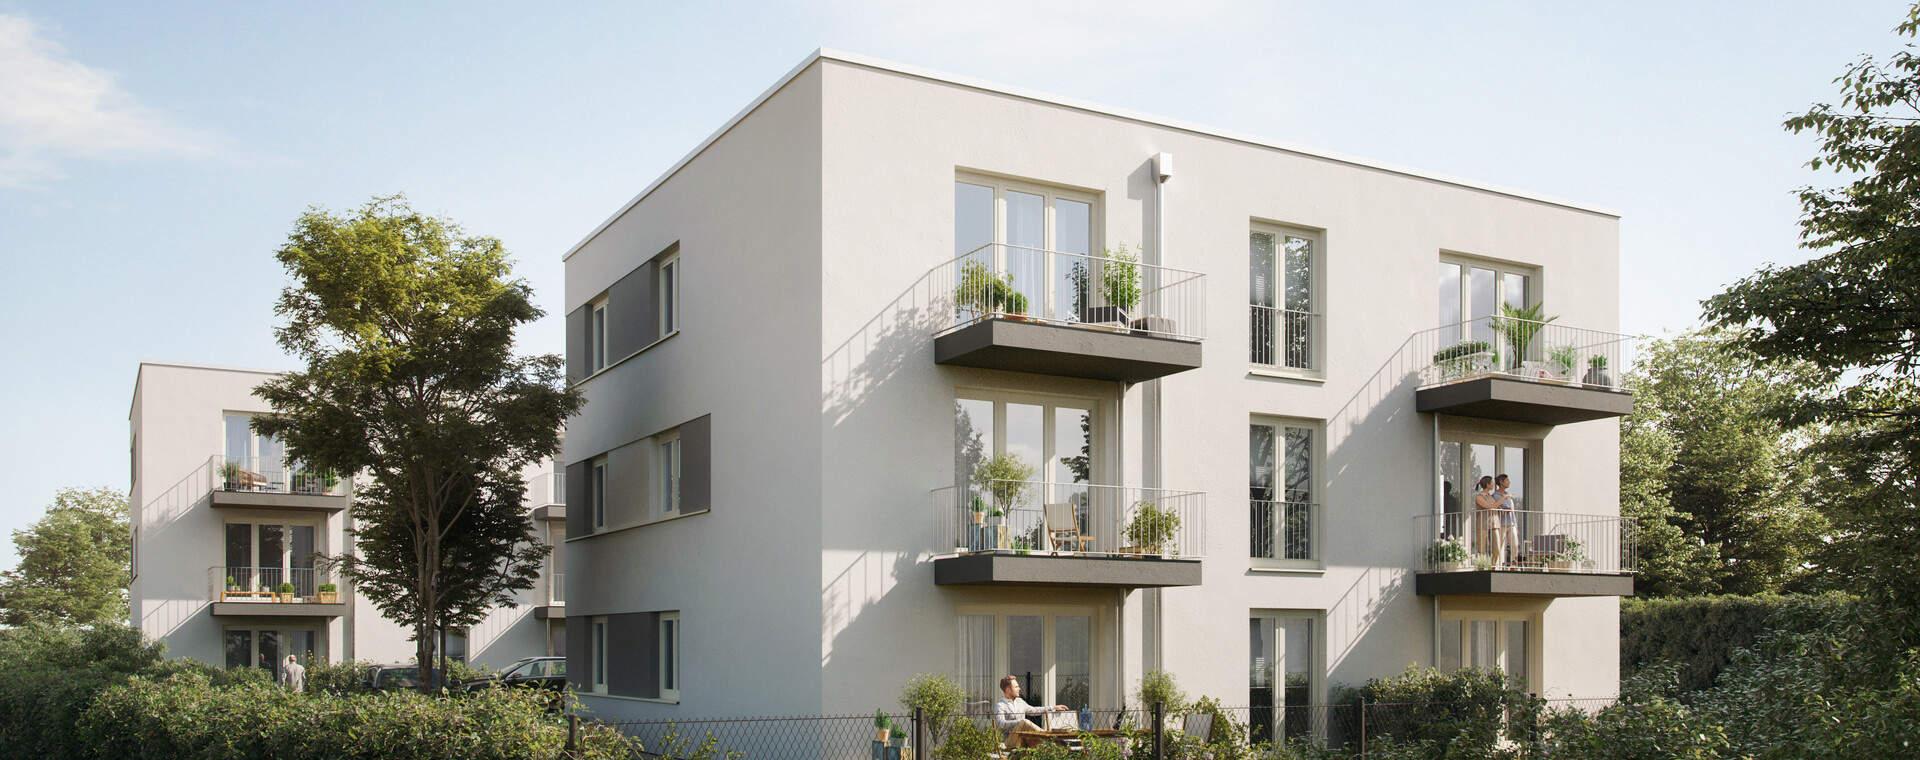 Singles hohen neuendorf